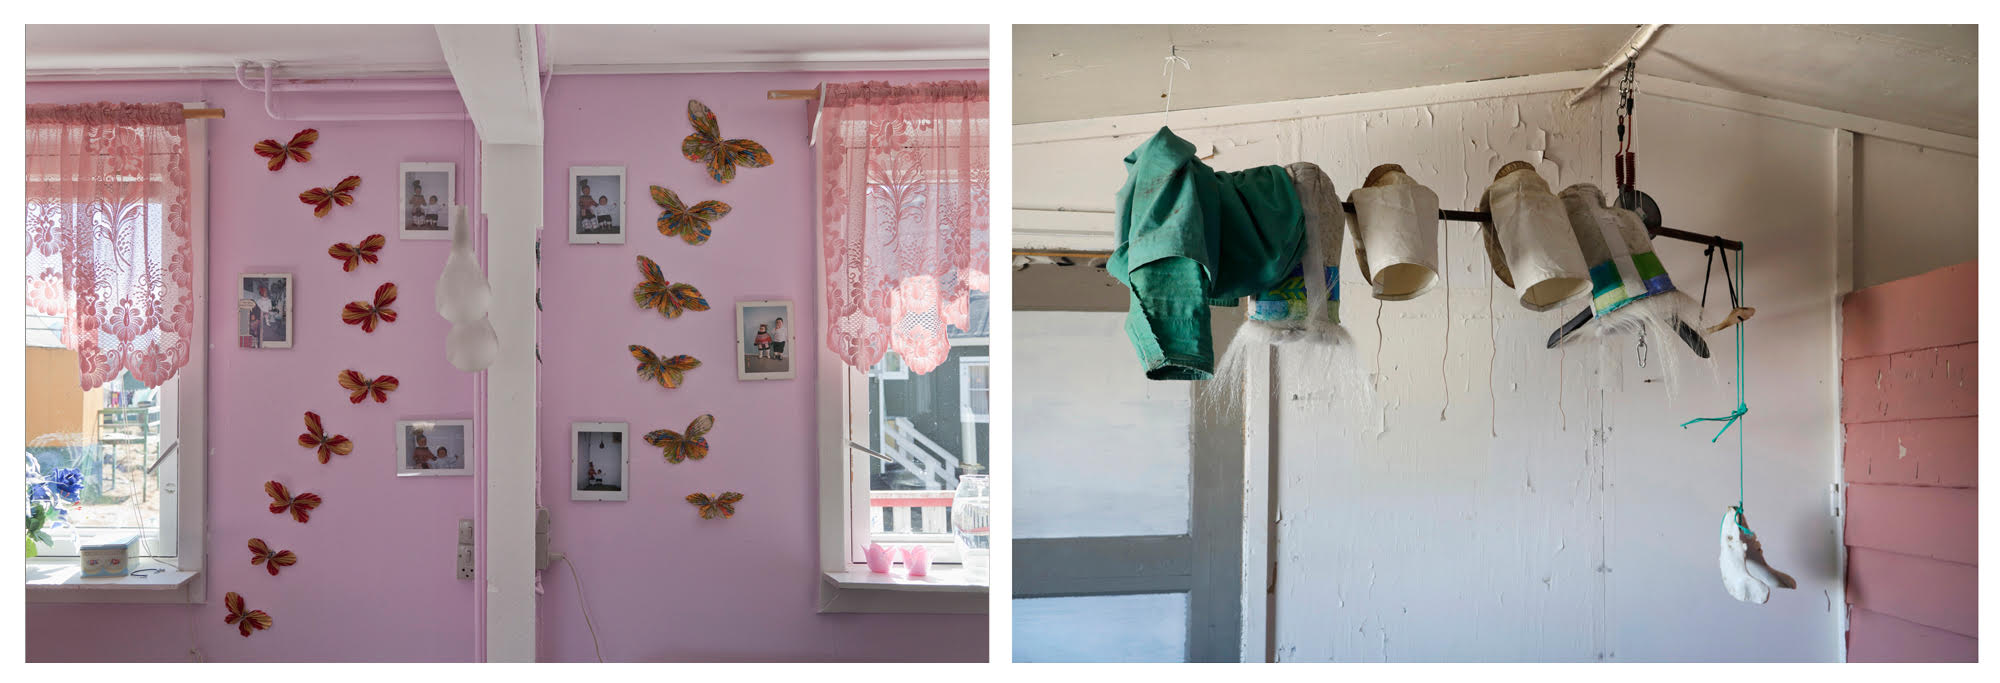 """Sila Window and Butterflies"", © Corina Gamma, Untitled, [Butterflies and hunting garments], Itilleq 2011, Qaanaaq, 2015"